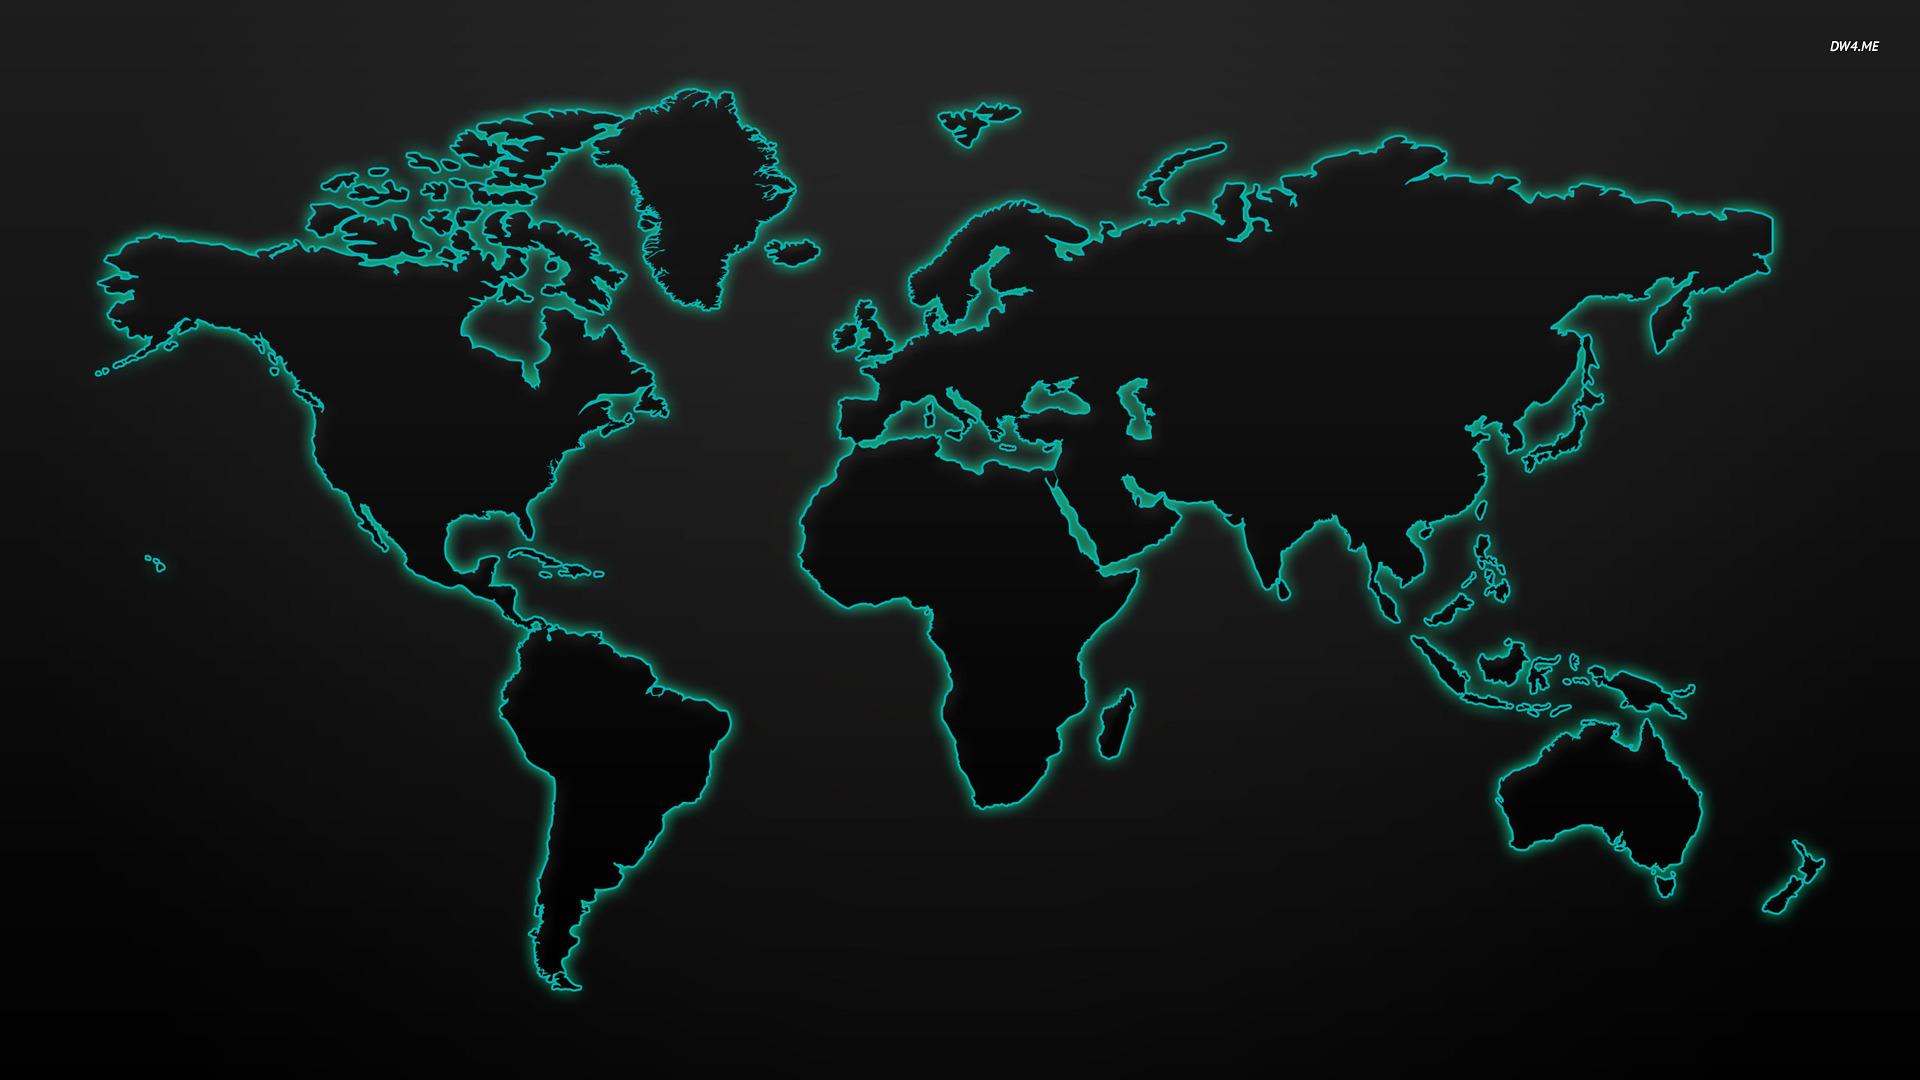 Pix for gt black world map wallpaper map black and white wallpaper pix for gt black world map wallpaper map black and white wallpaper for walls uk home mural australia diy nz depot gumiabroncs Gallery